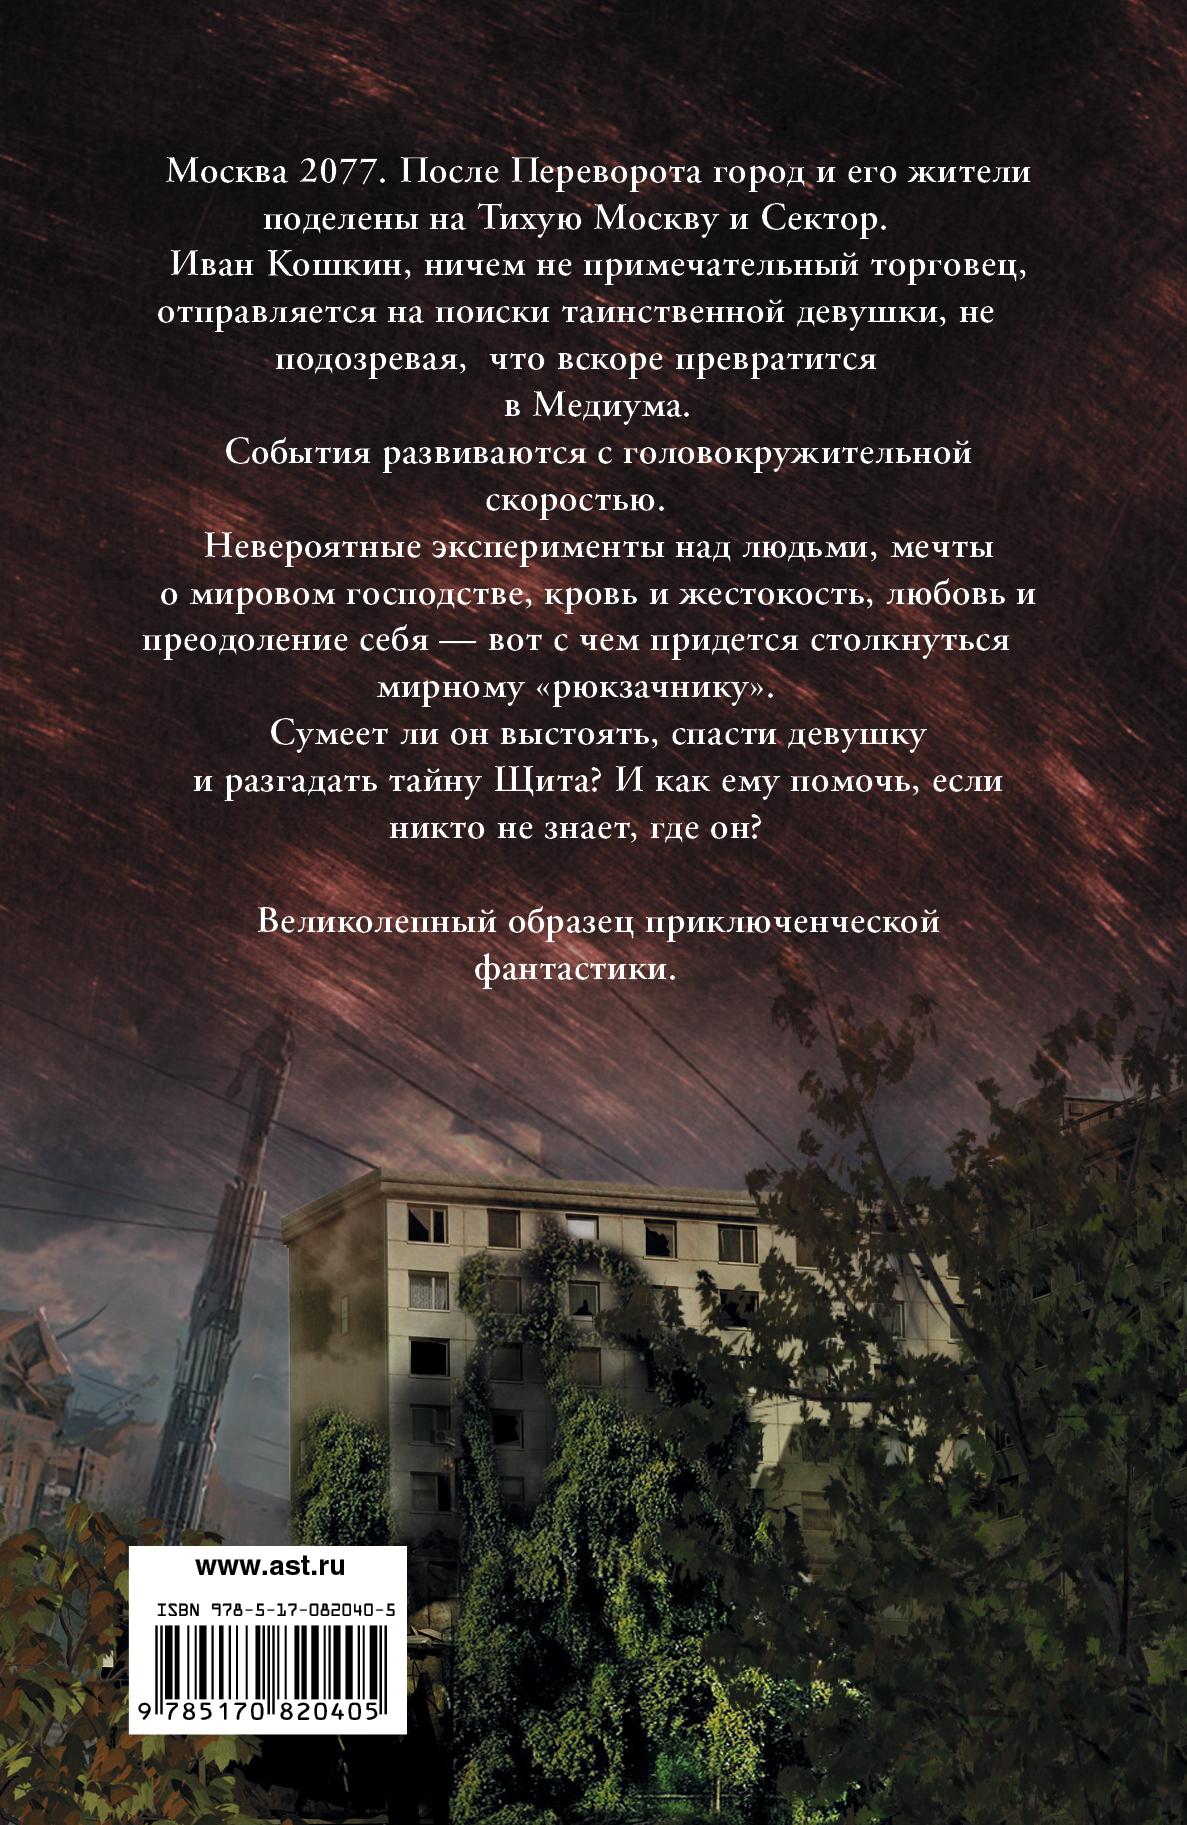 Москва 2077. Медиум